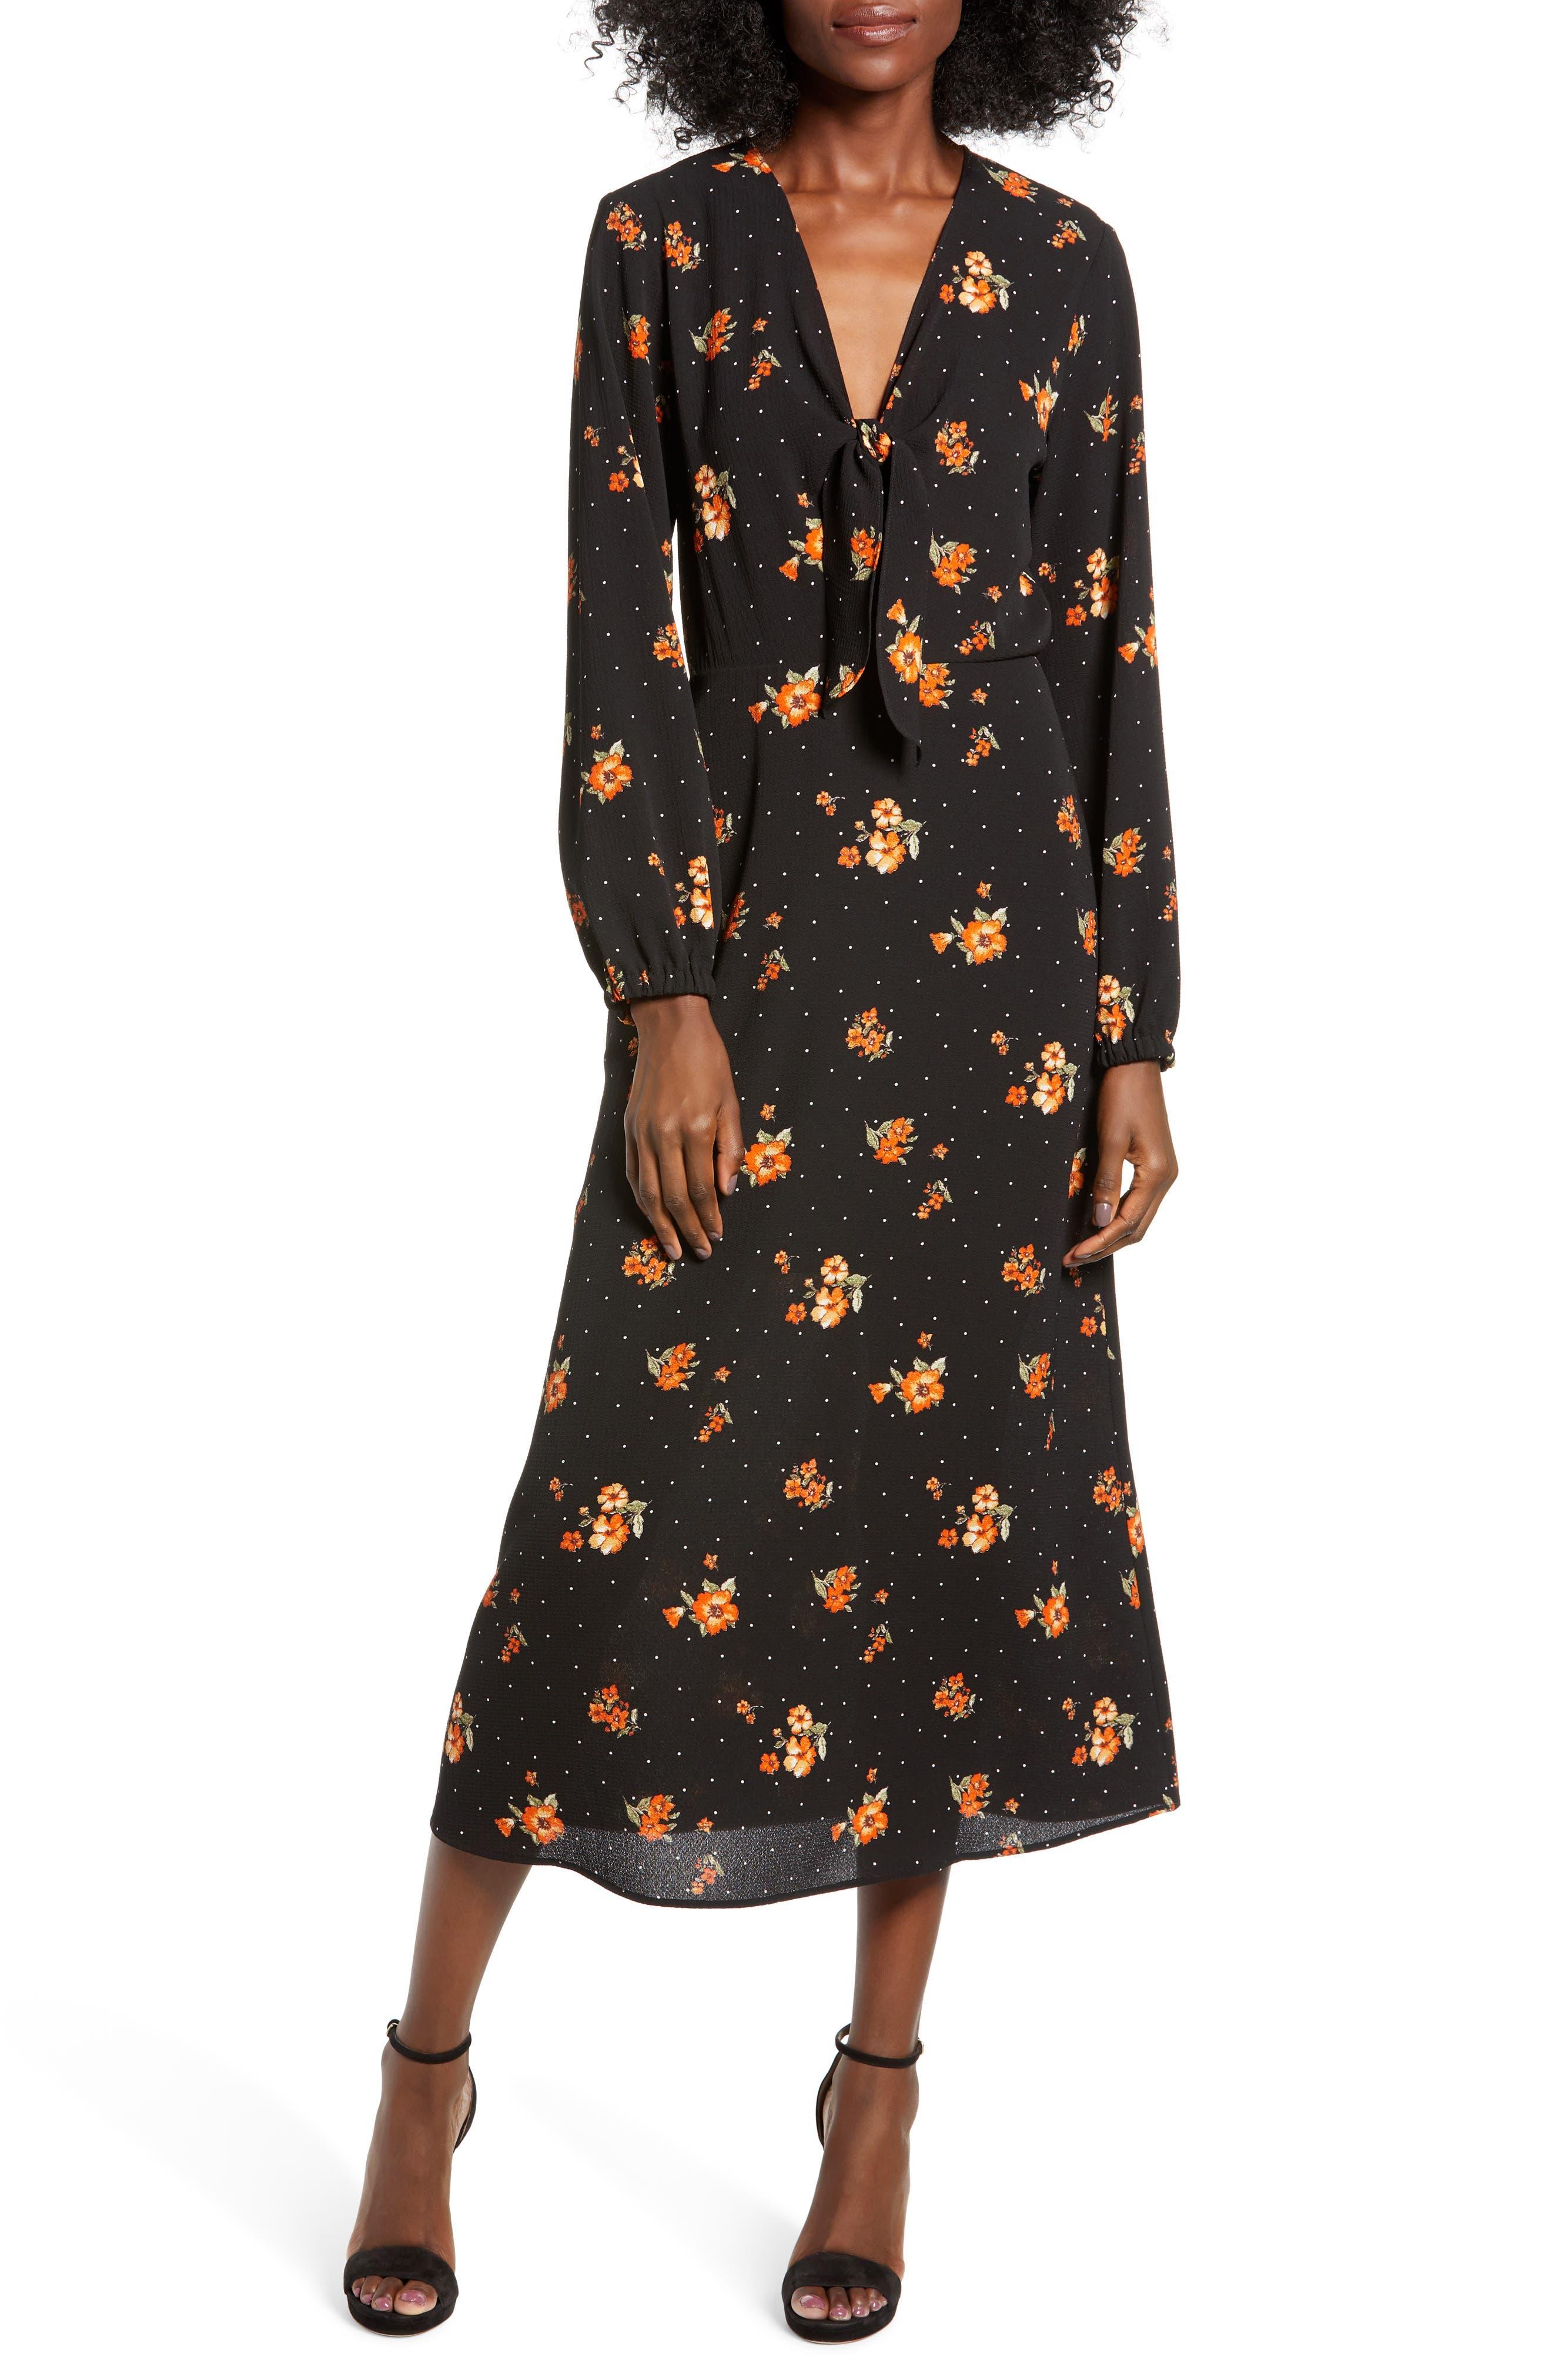 ALL IN FAVOR Tie Detail Midi Dress, Main, color, 001